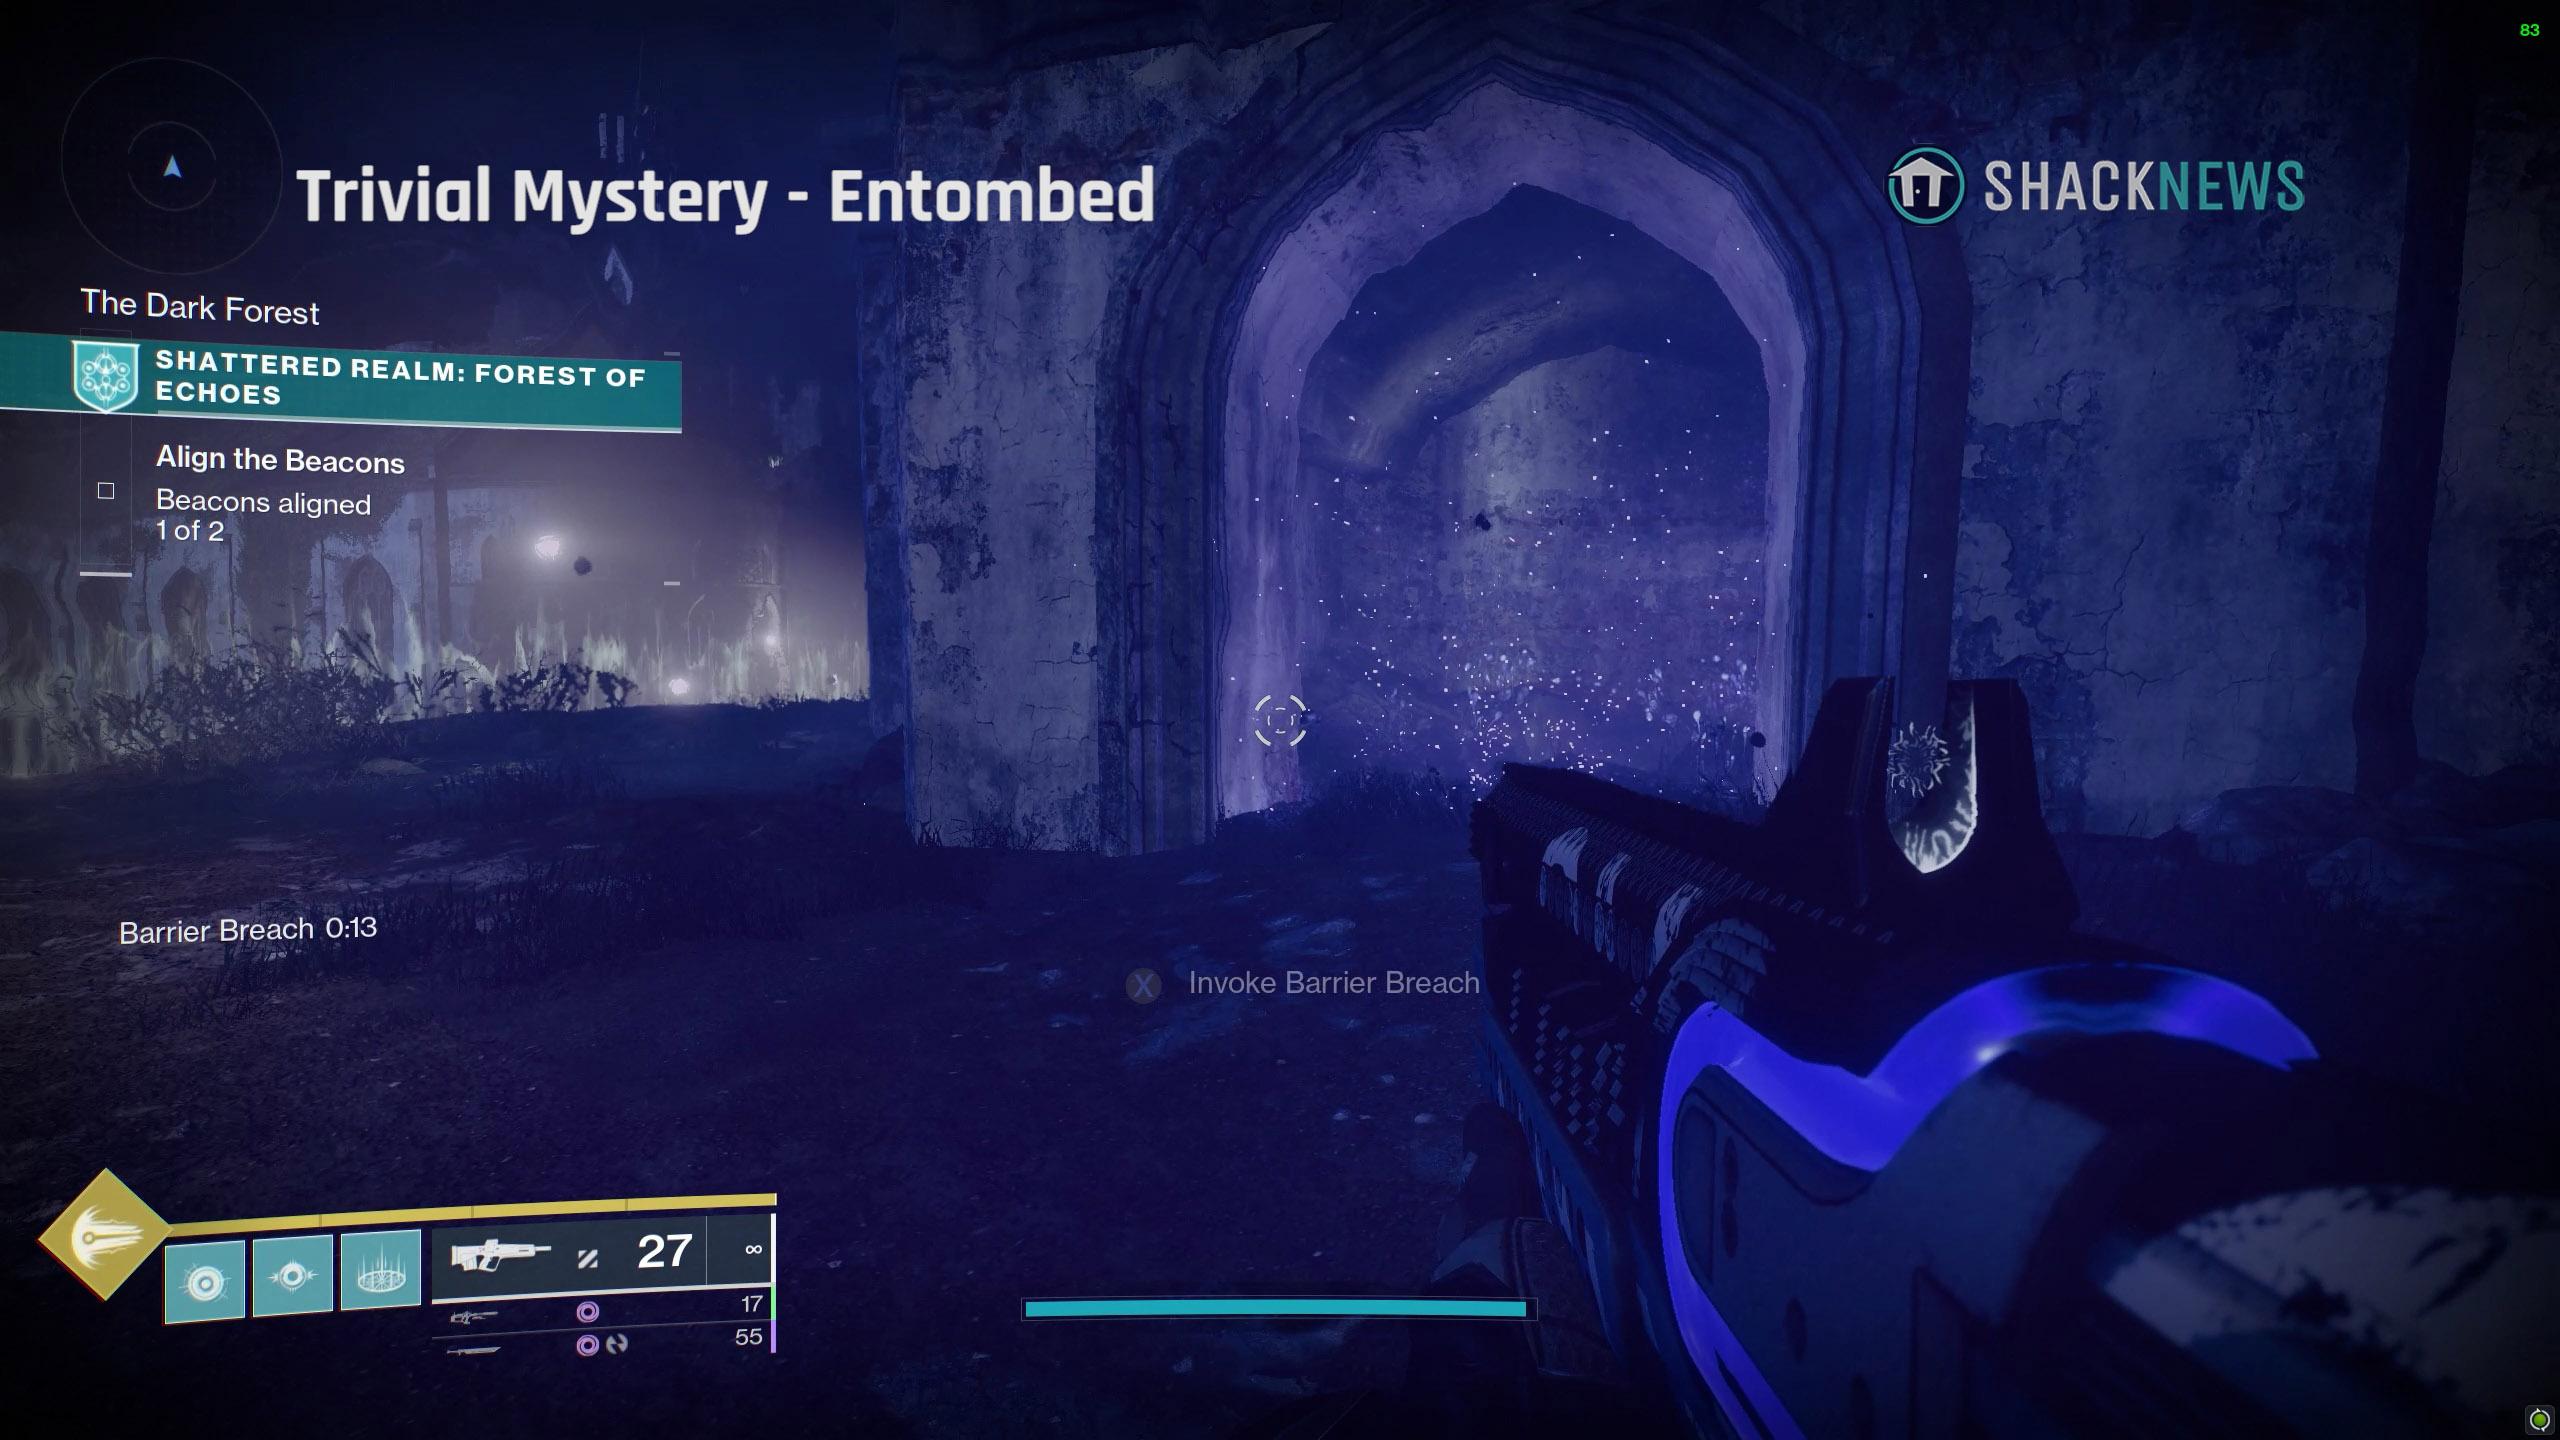 destiny 2 trivial mystery entombed